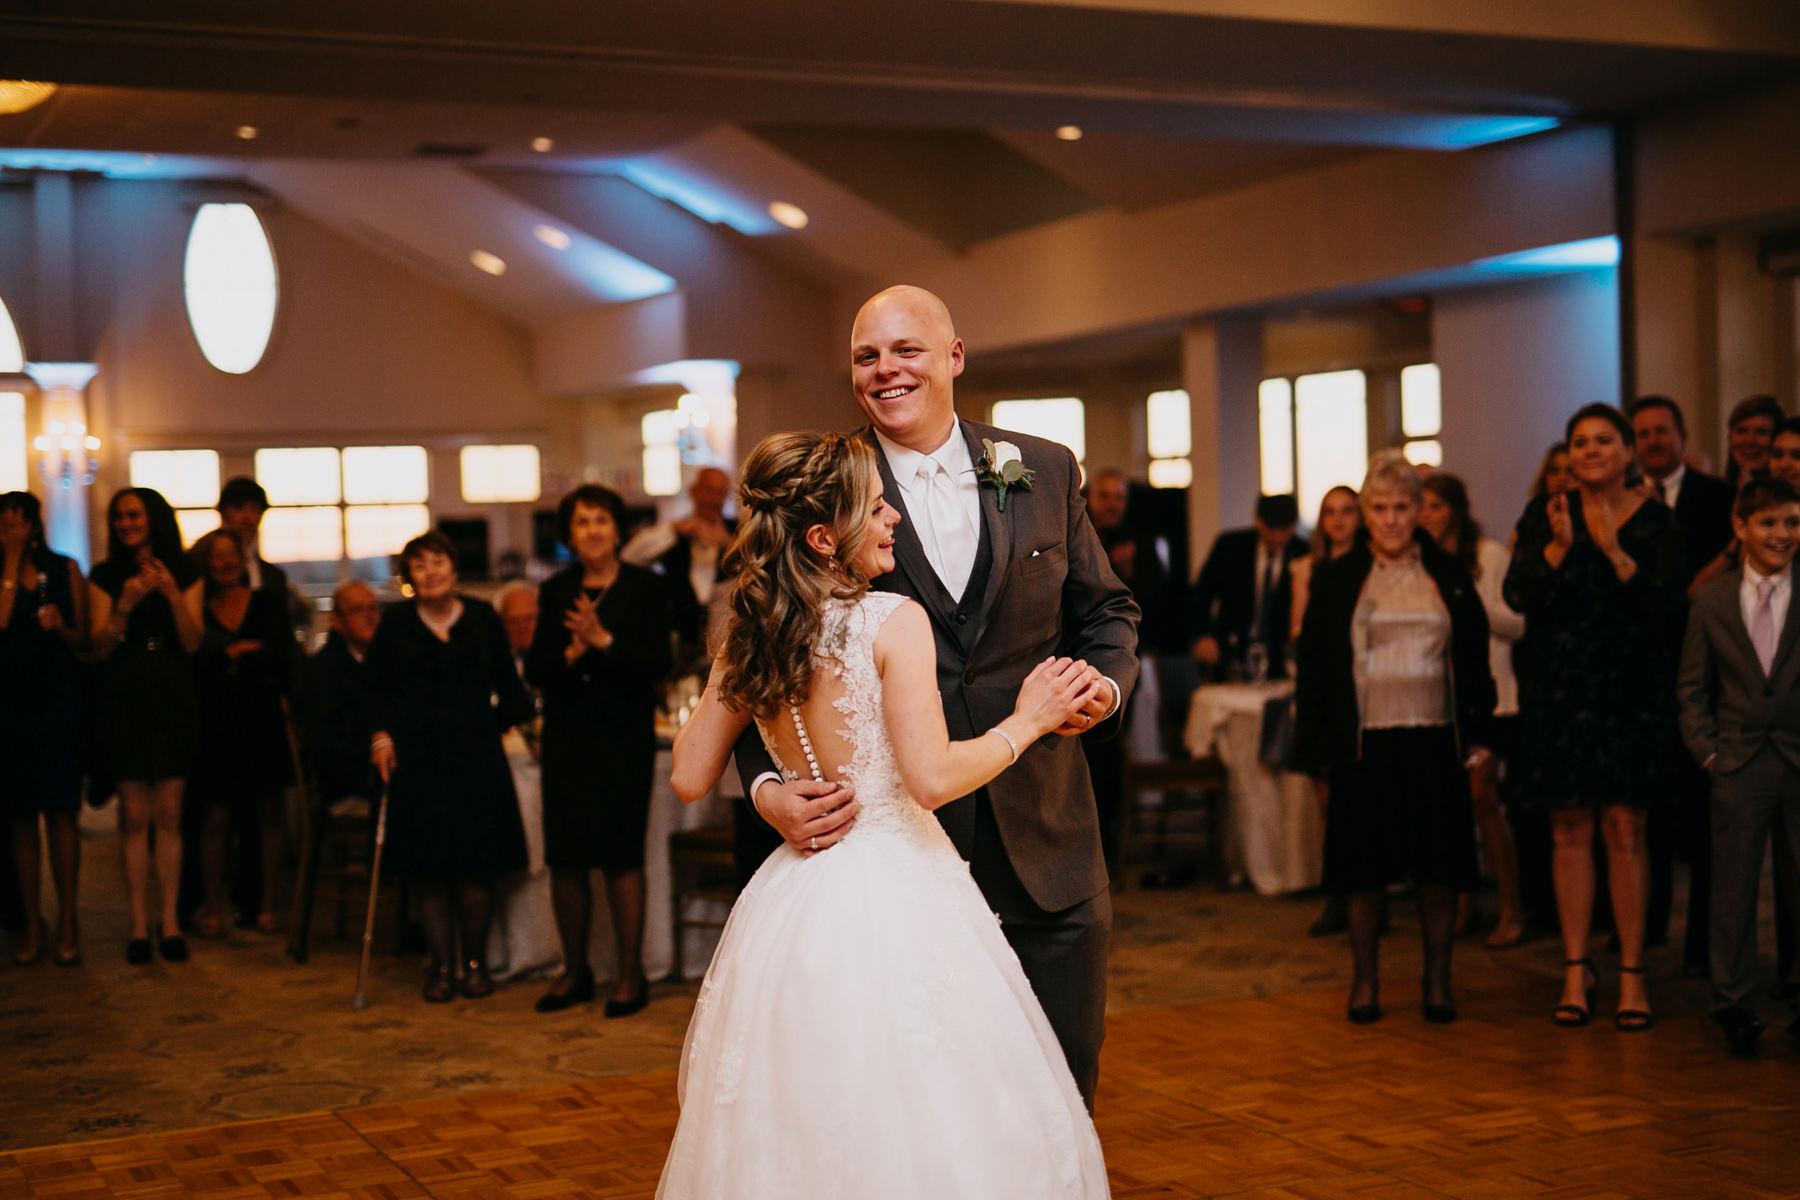 Quincy Ma Massachusetts Wedding Dedham Boston Granie Links Wedding New England Catholic Cathedral Liz Osban Photography 91.jpg